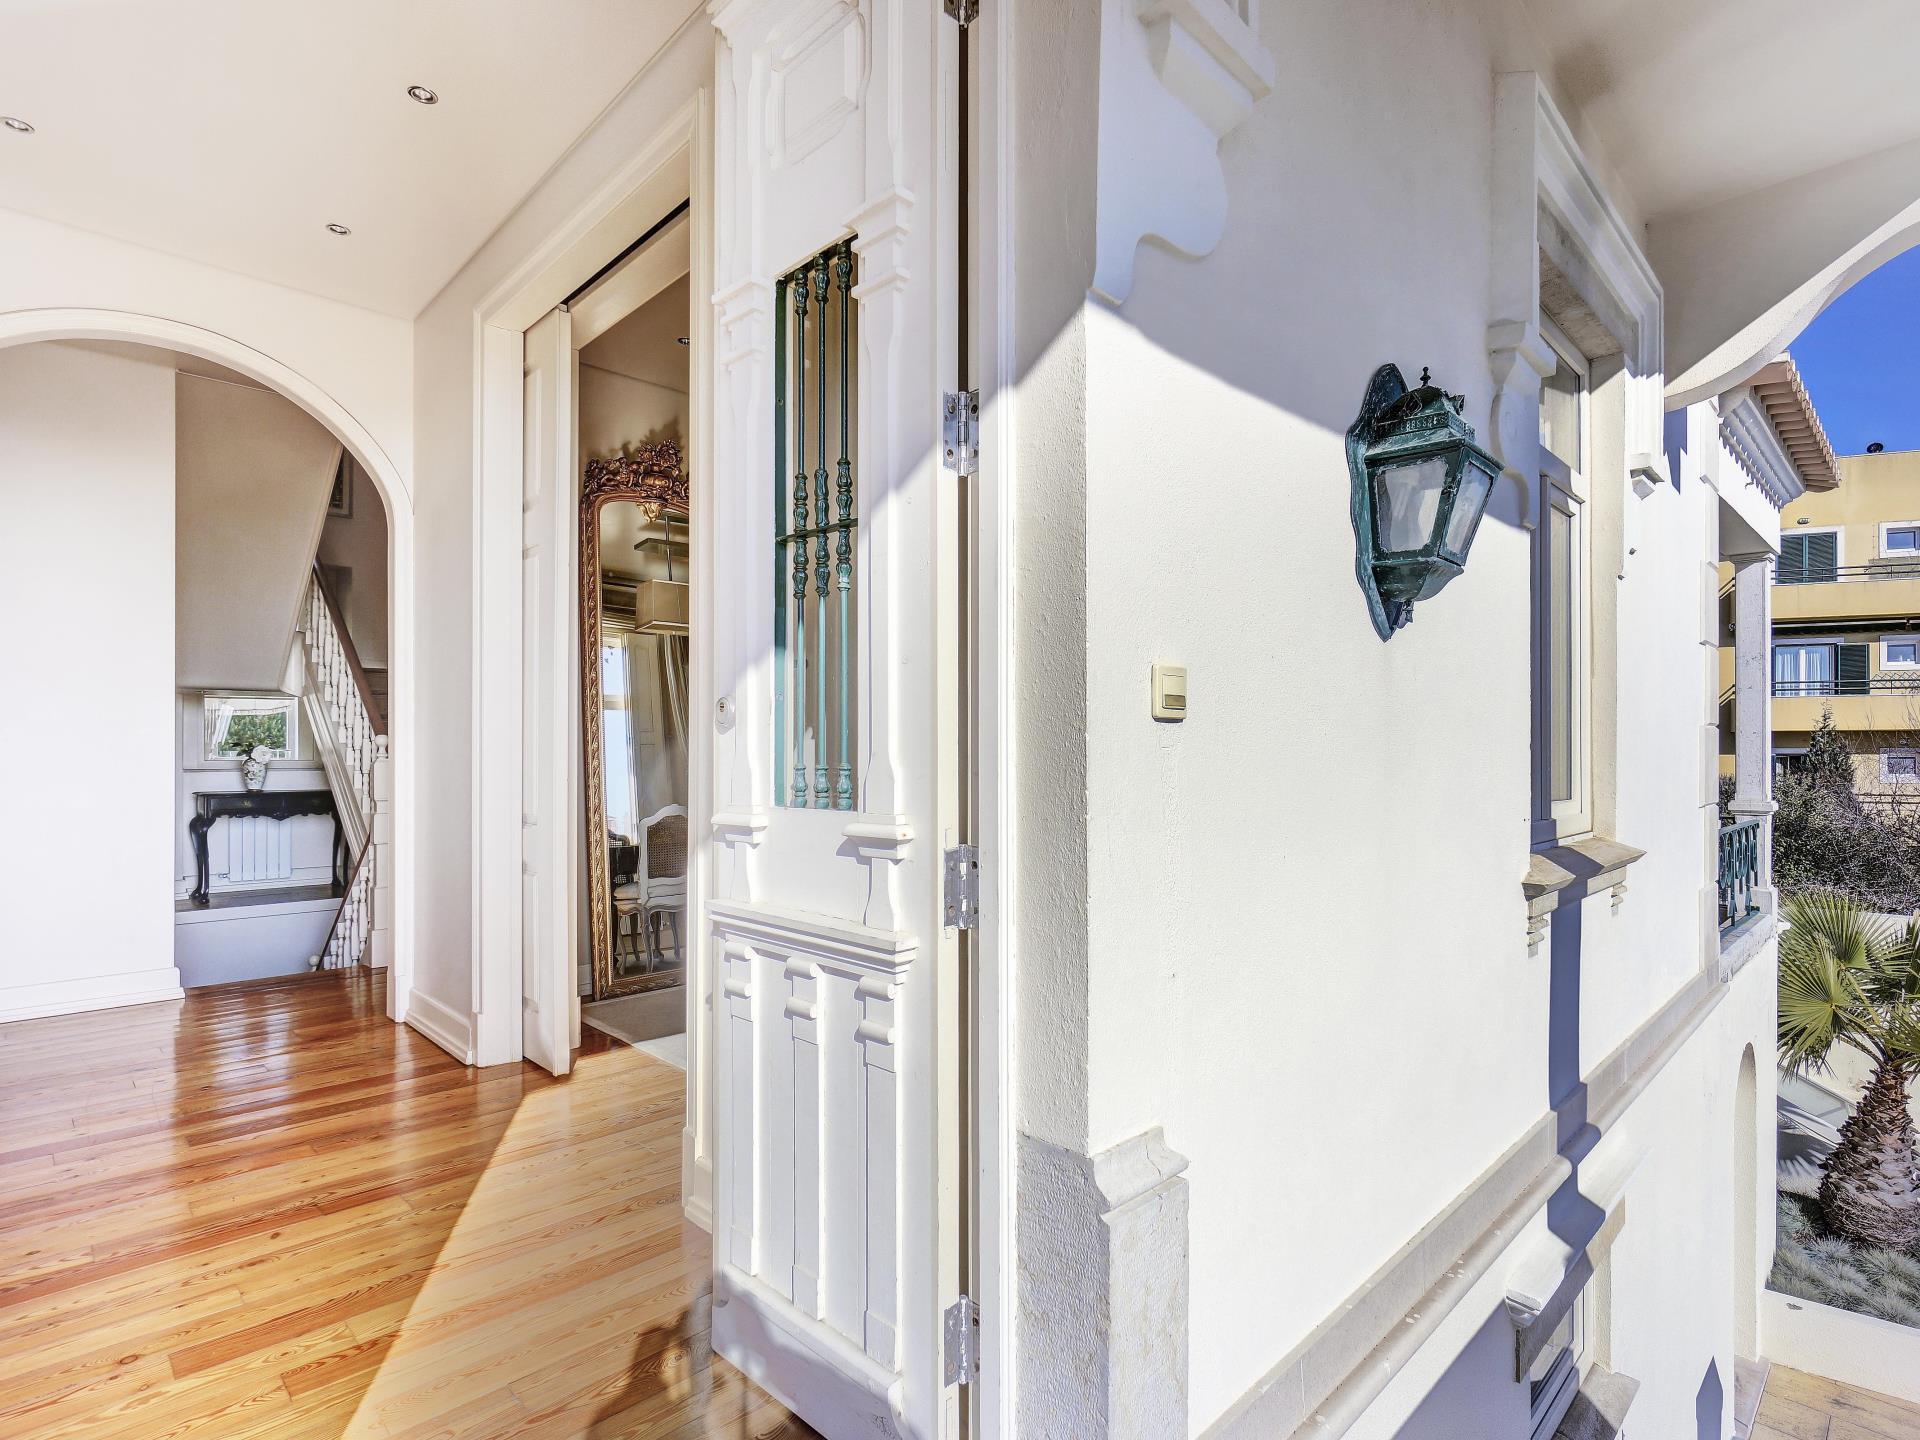 Tek Ailelik Ev için Satış at Detached house, 5 bedrooms, for Sale Cascais, Lisboa Portekiz